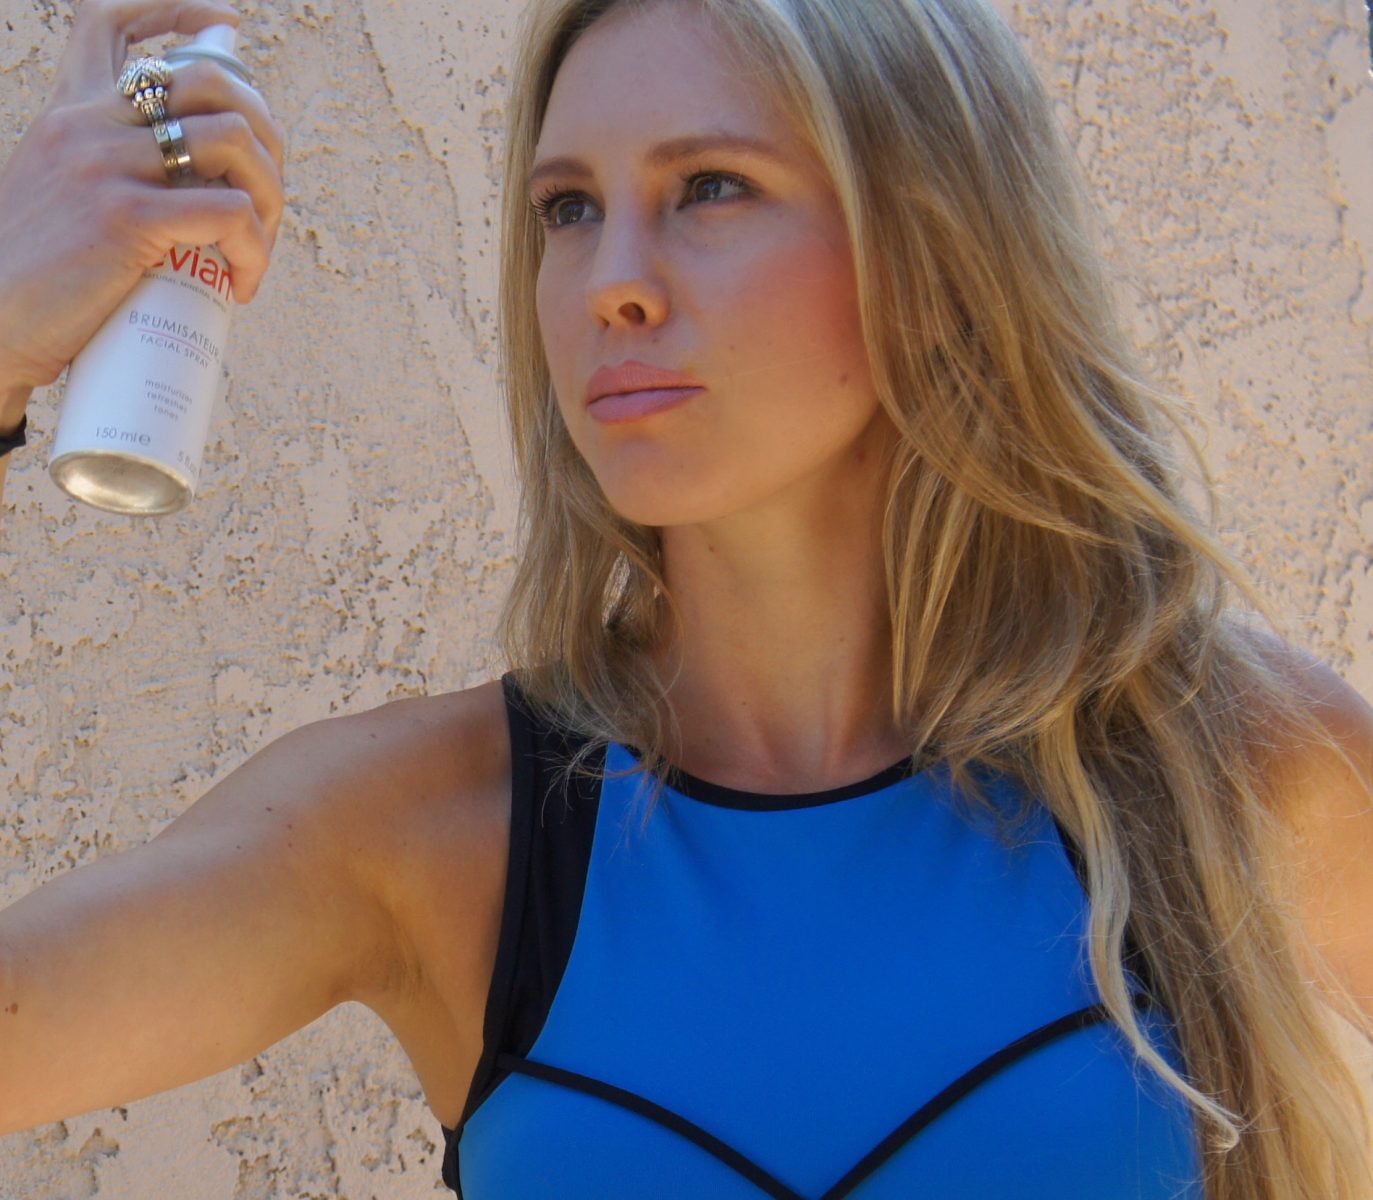 Evian Spray for Hydration